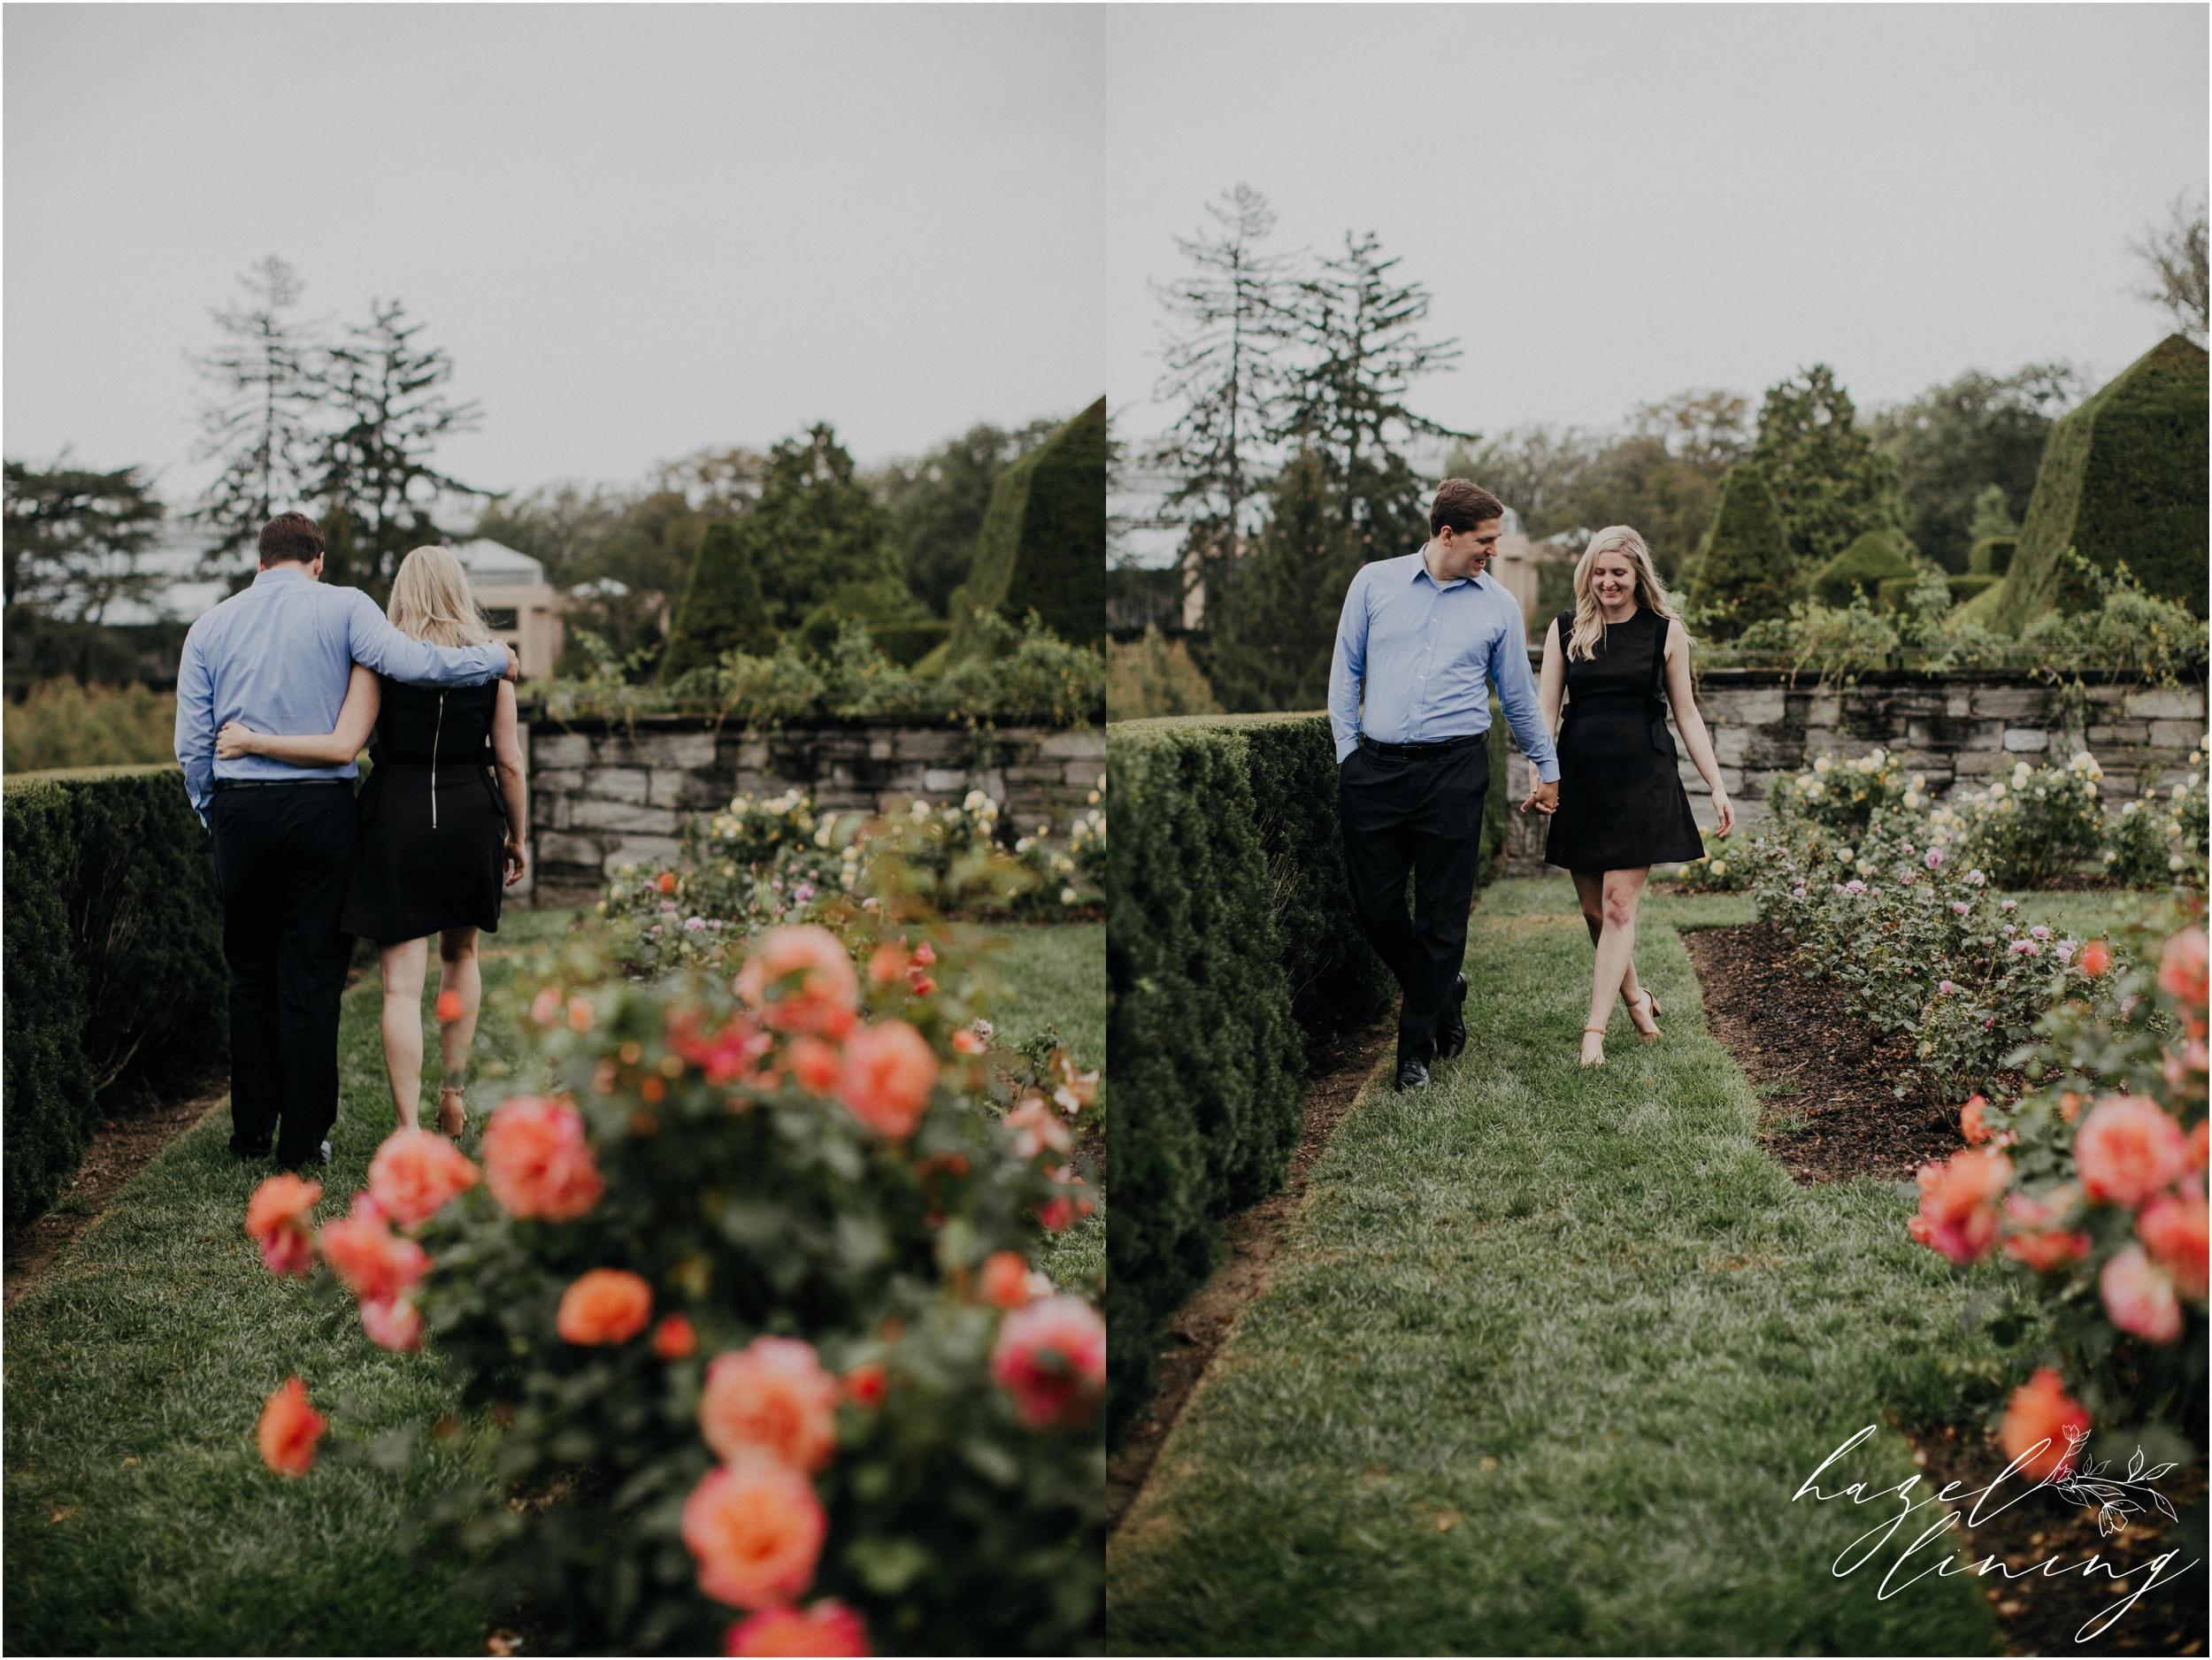 victoria-travis-logan-mayes-longwood-gardens-kennett-square-philadelphia-engagement-session-hazel-lining-photography-destination-elopement-wedding-engagement-photography_0012.jpg